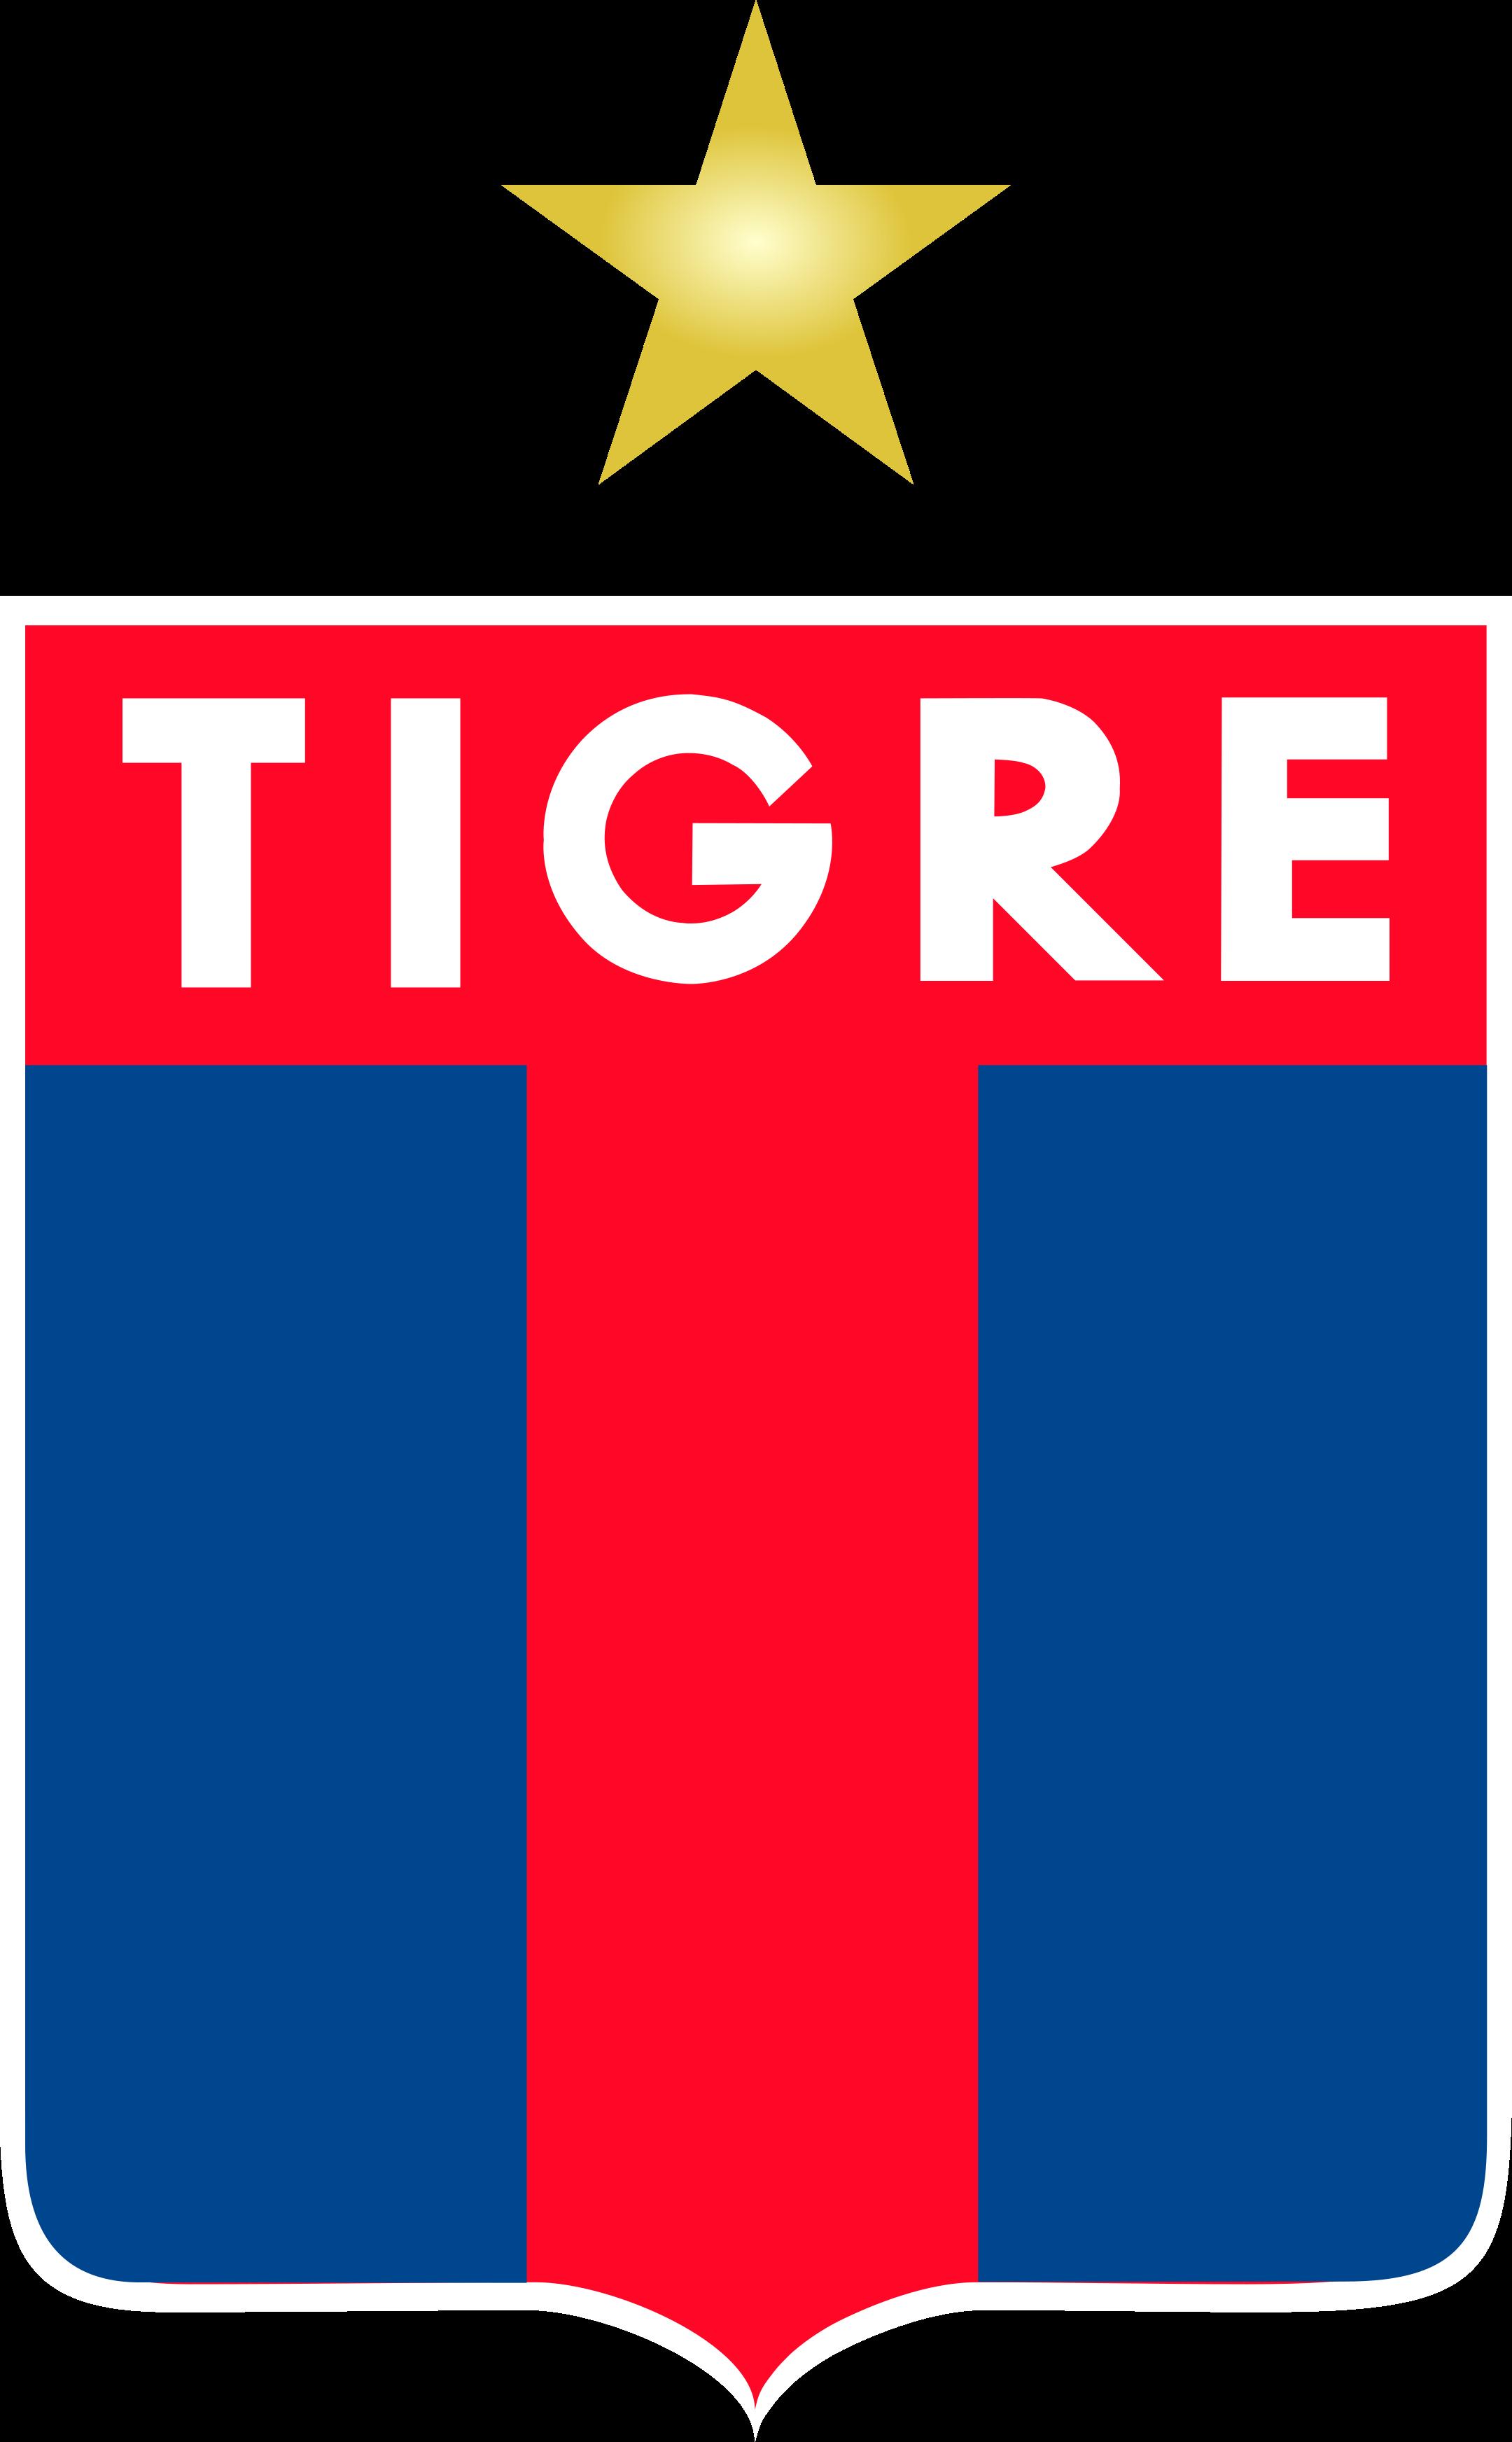 tigre logo argentina 1 - Club Atlético Tigre Logo - Escudo